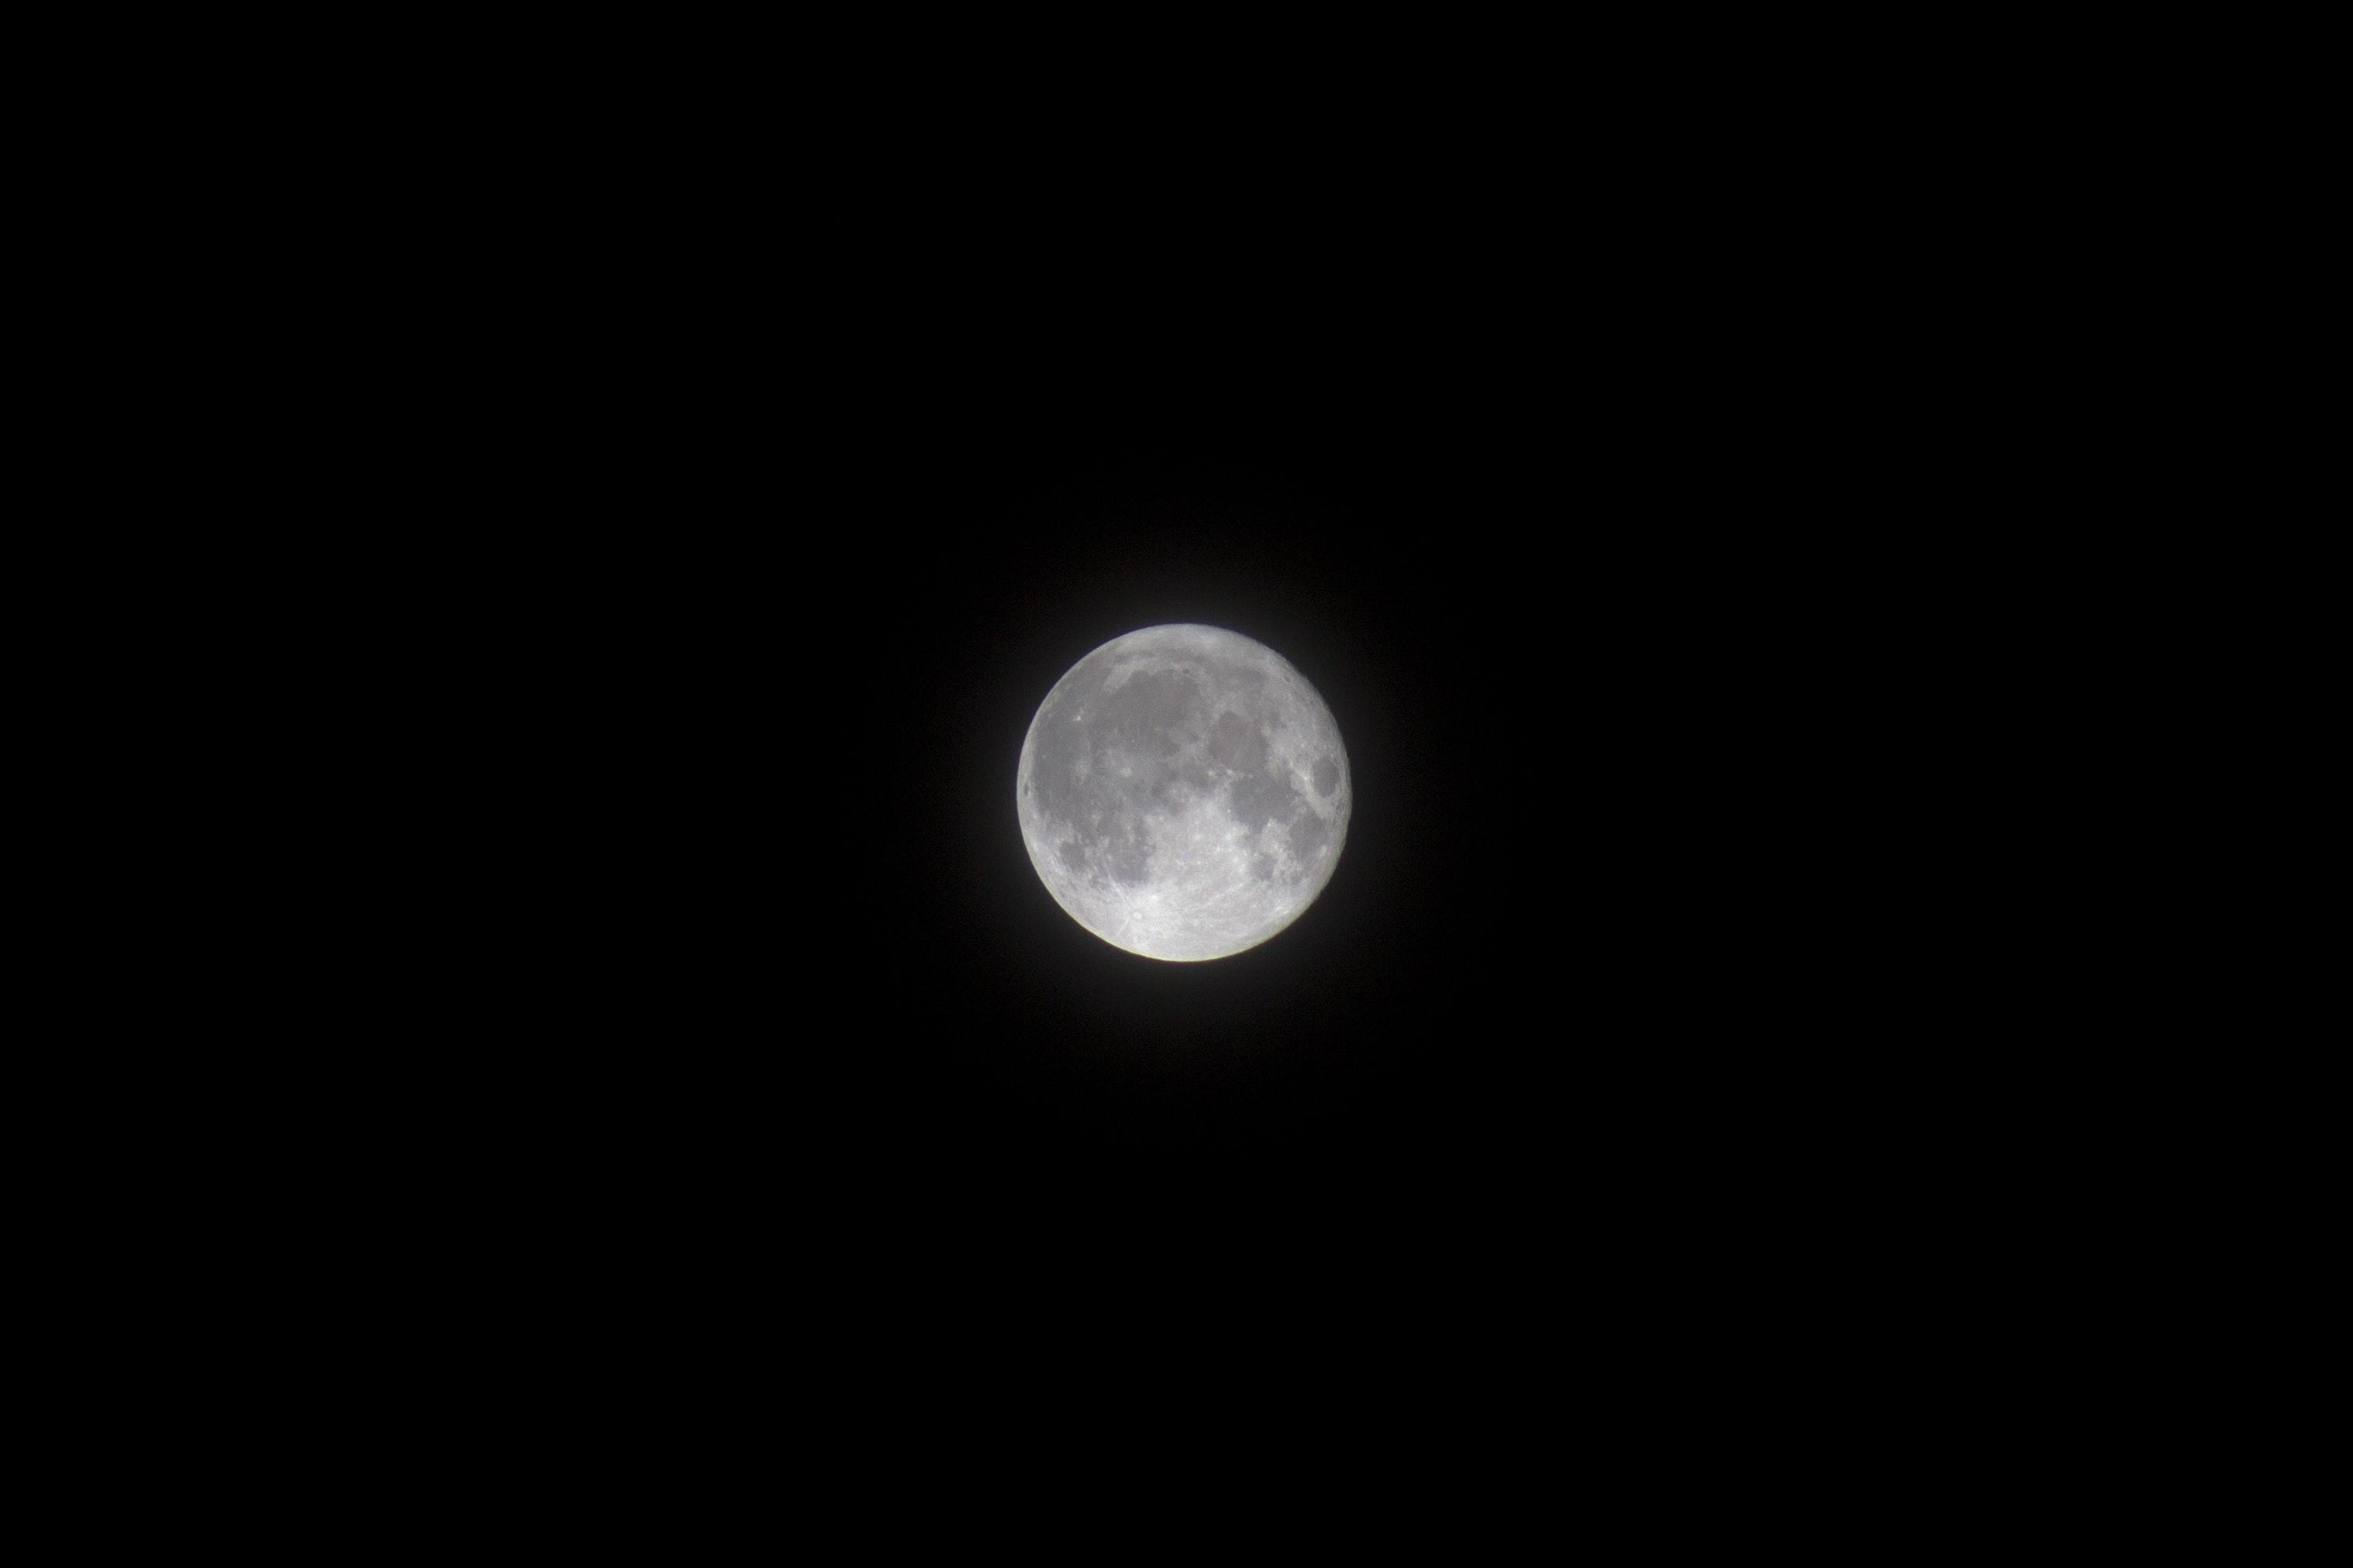 Best Wallpaper Night Dark - nature-sky-moon-night-238088  Image.jpg\u0026fm\u003djpg